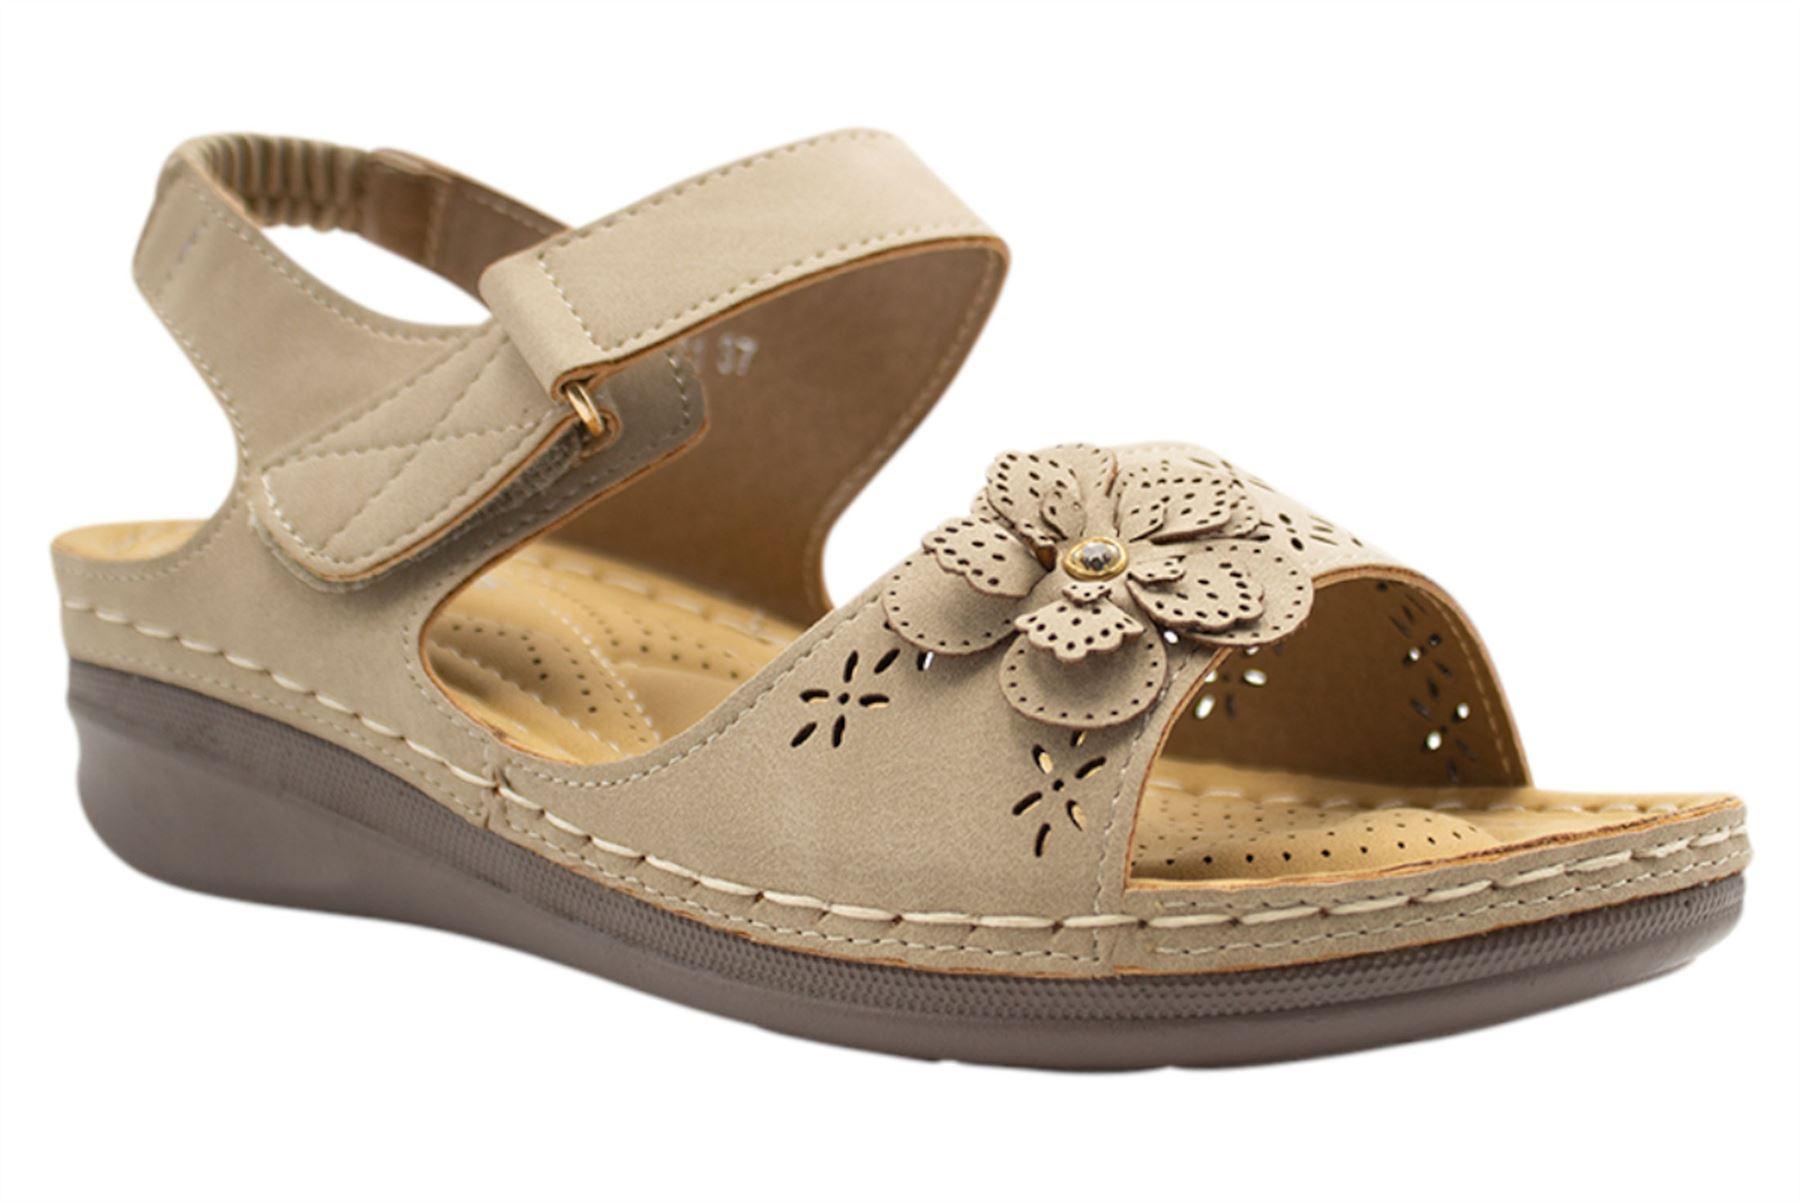 Ladies-Sandals-Womens-Mid-Heel-Comfort-Summer-Beach-Casual-Wear miniatura 8